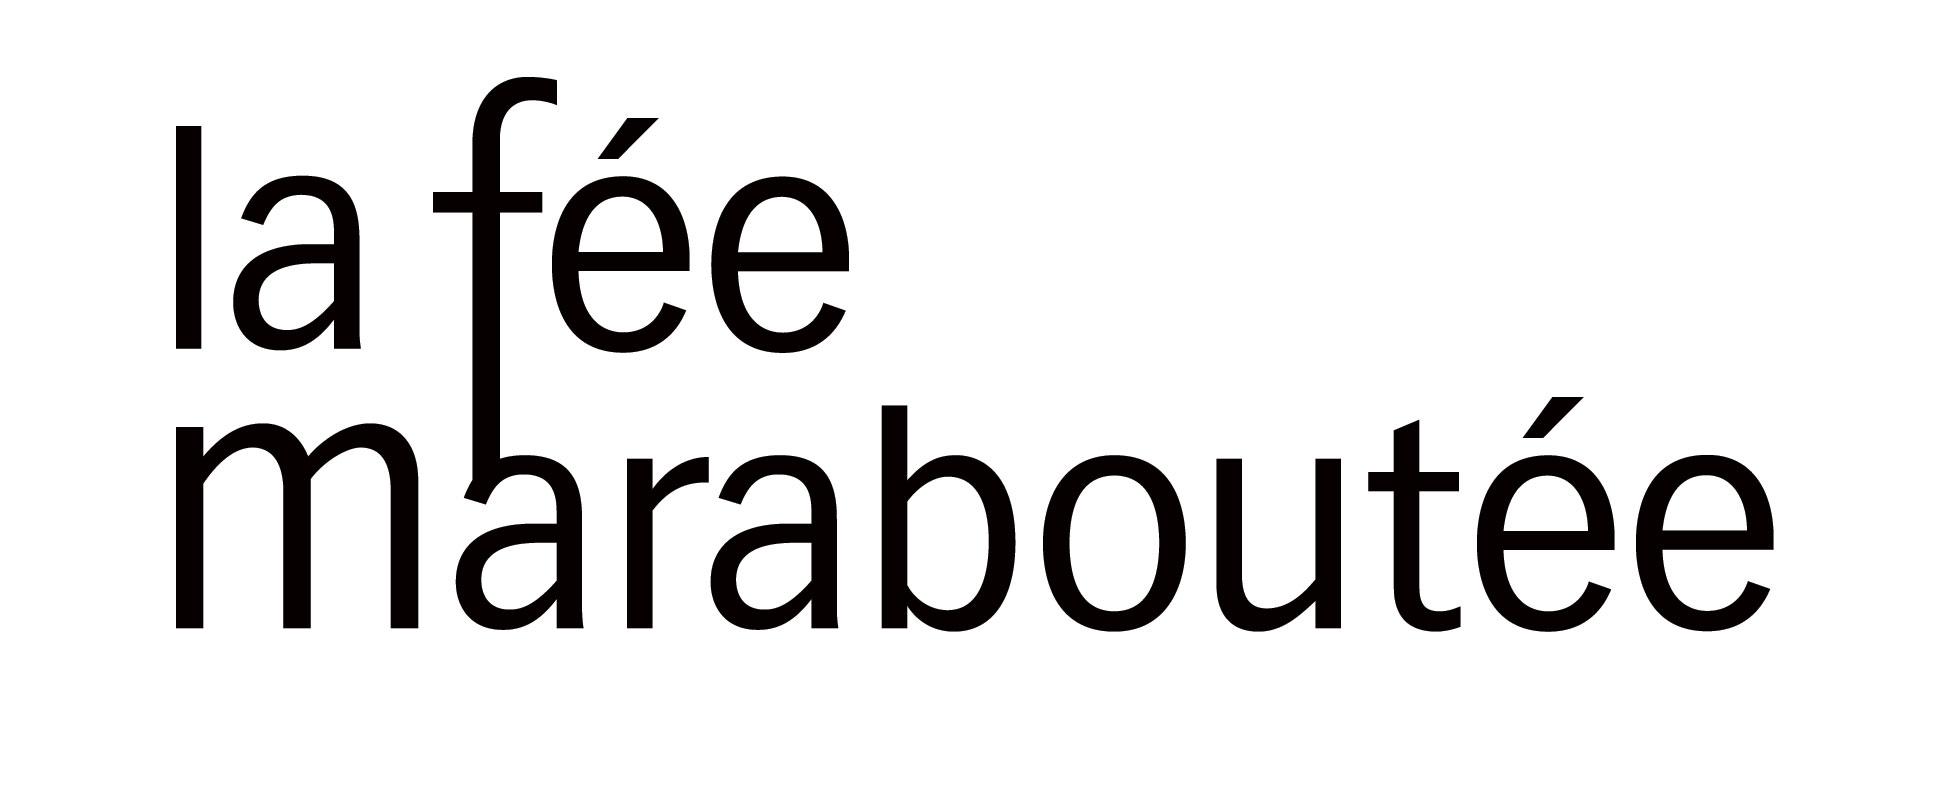 marque LA FEE MARABOUTEE